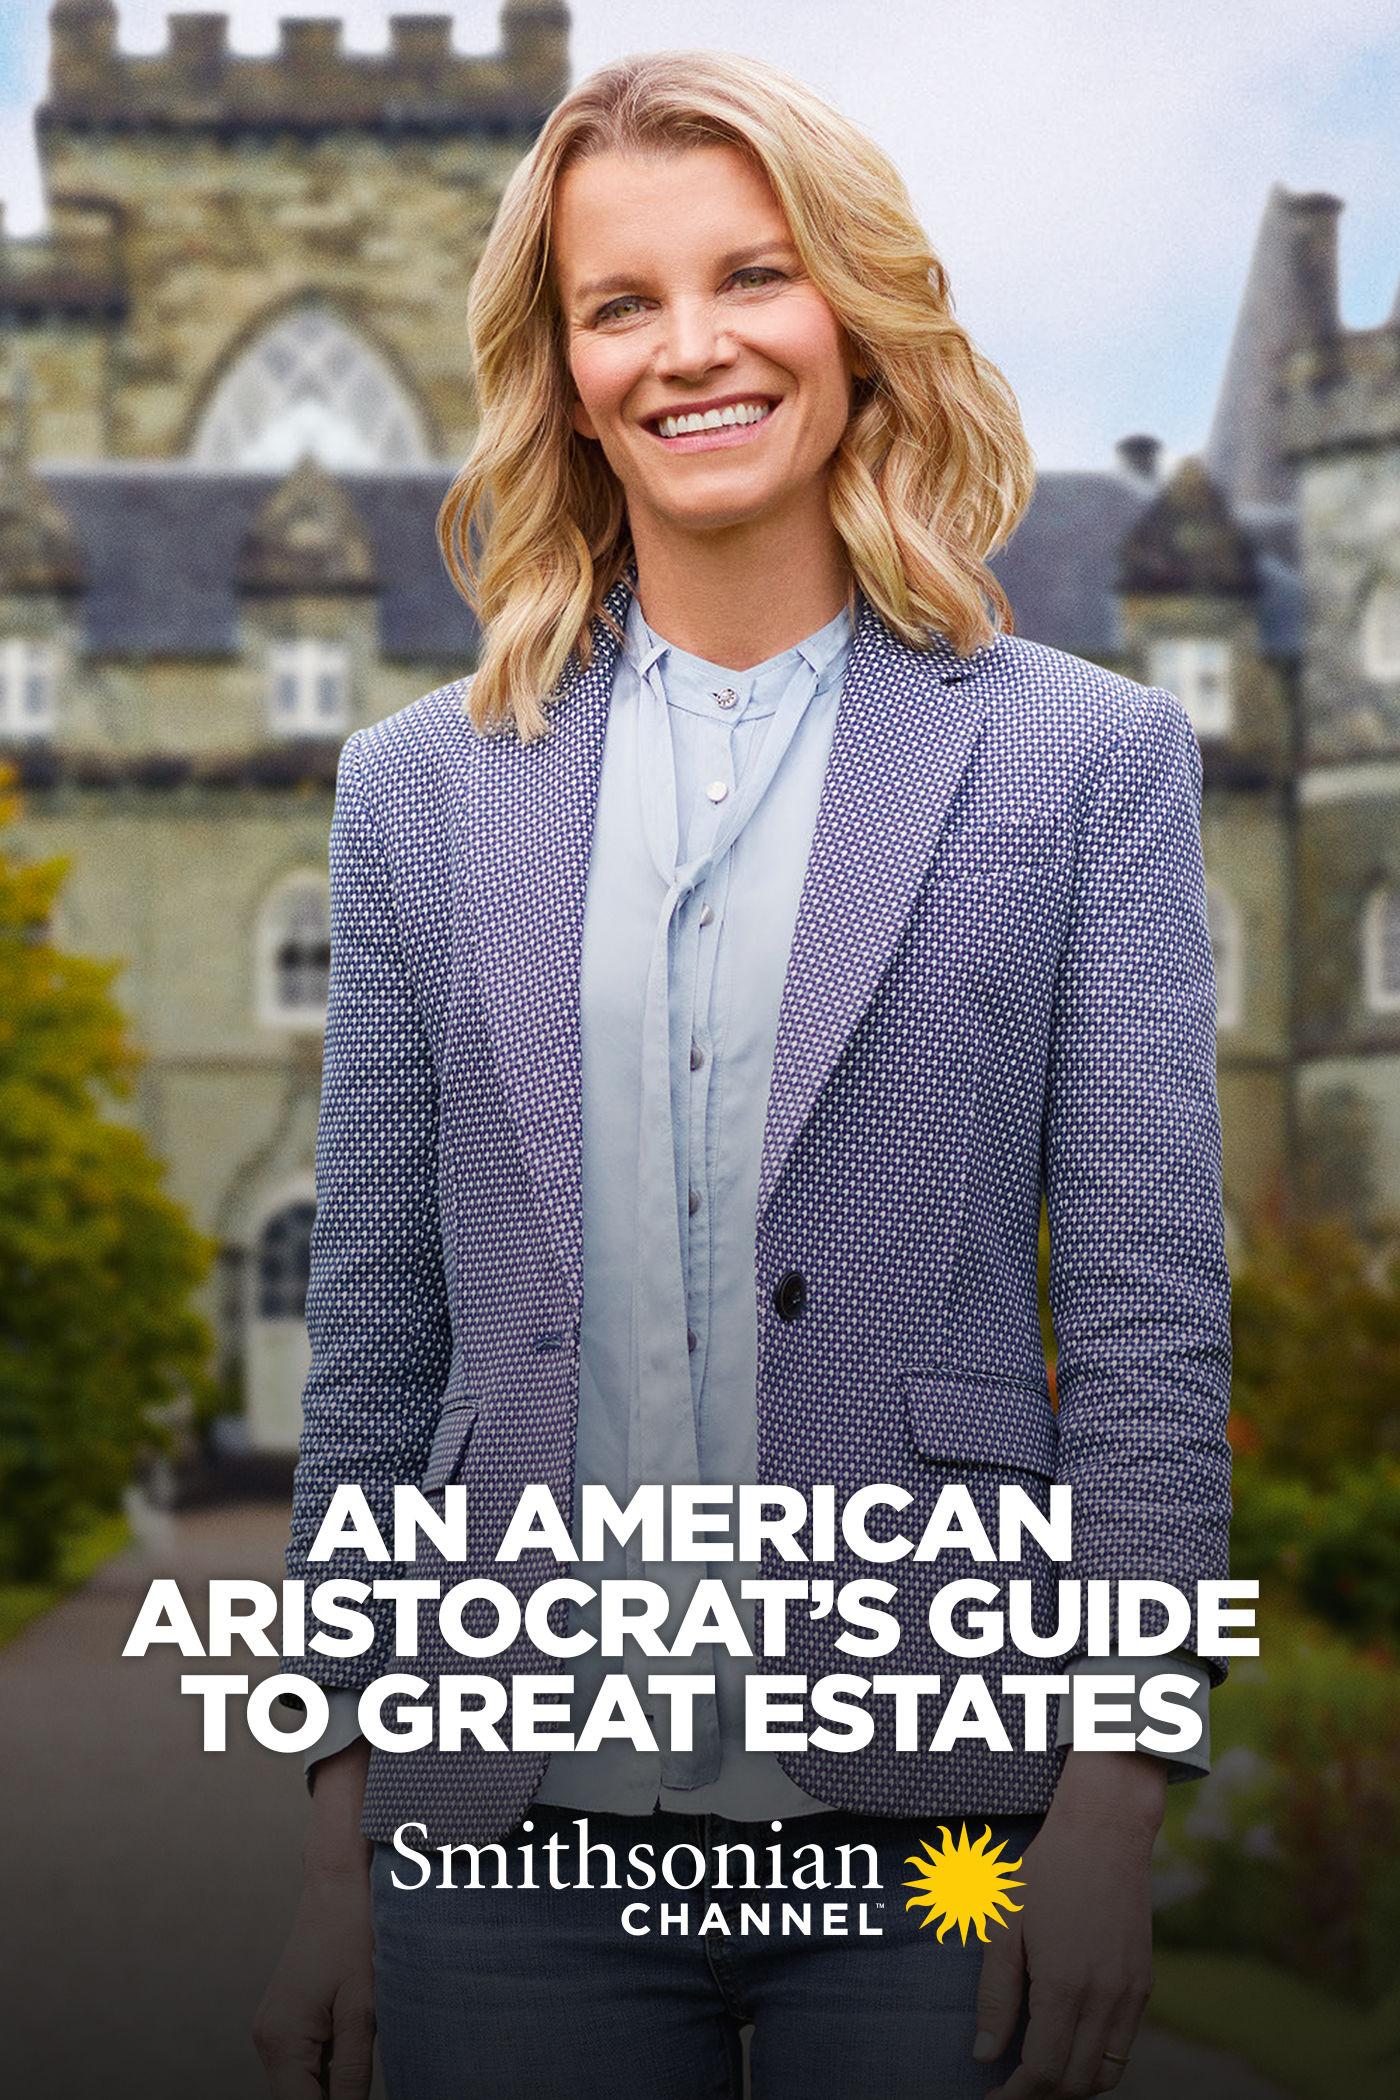 An American Aristocrat's Guide to Great Estates ne zaman